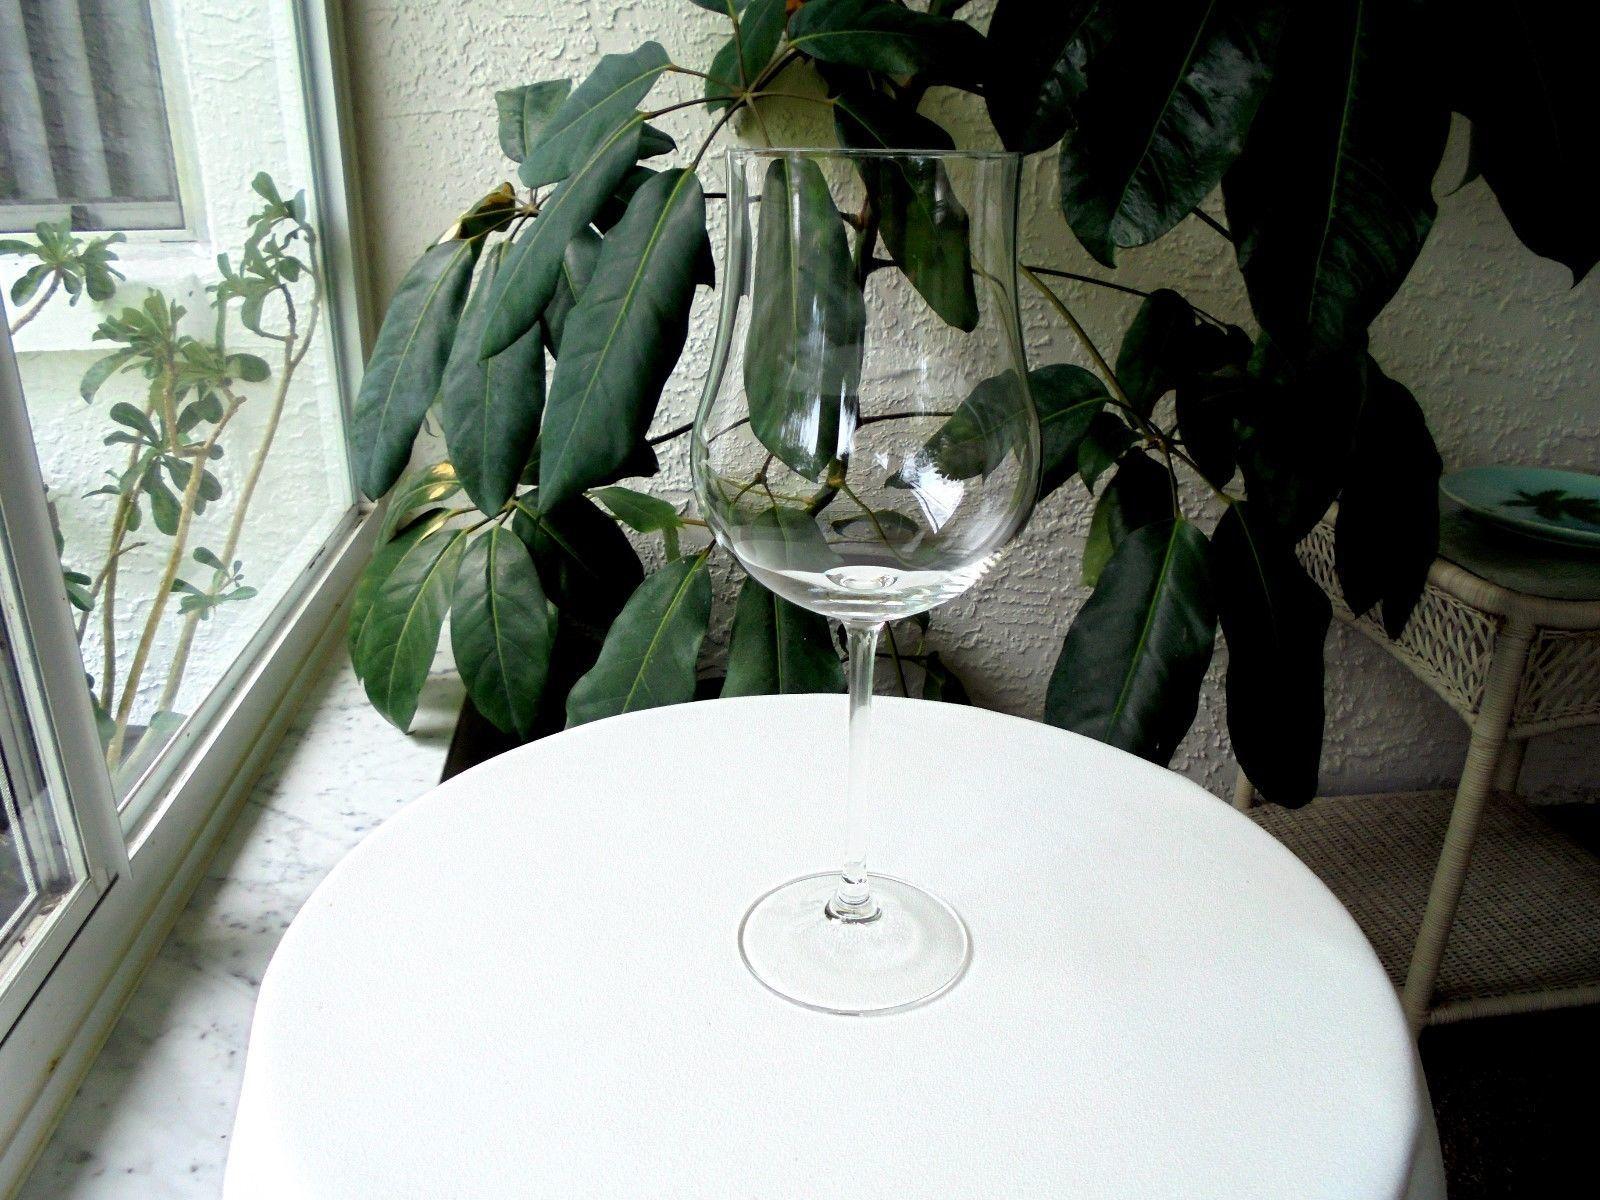 Mikasa Oenologue Beaujolais Clear Crystal Wine Goblet Multiple Avail